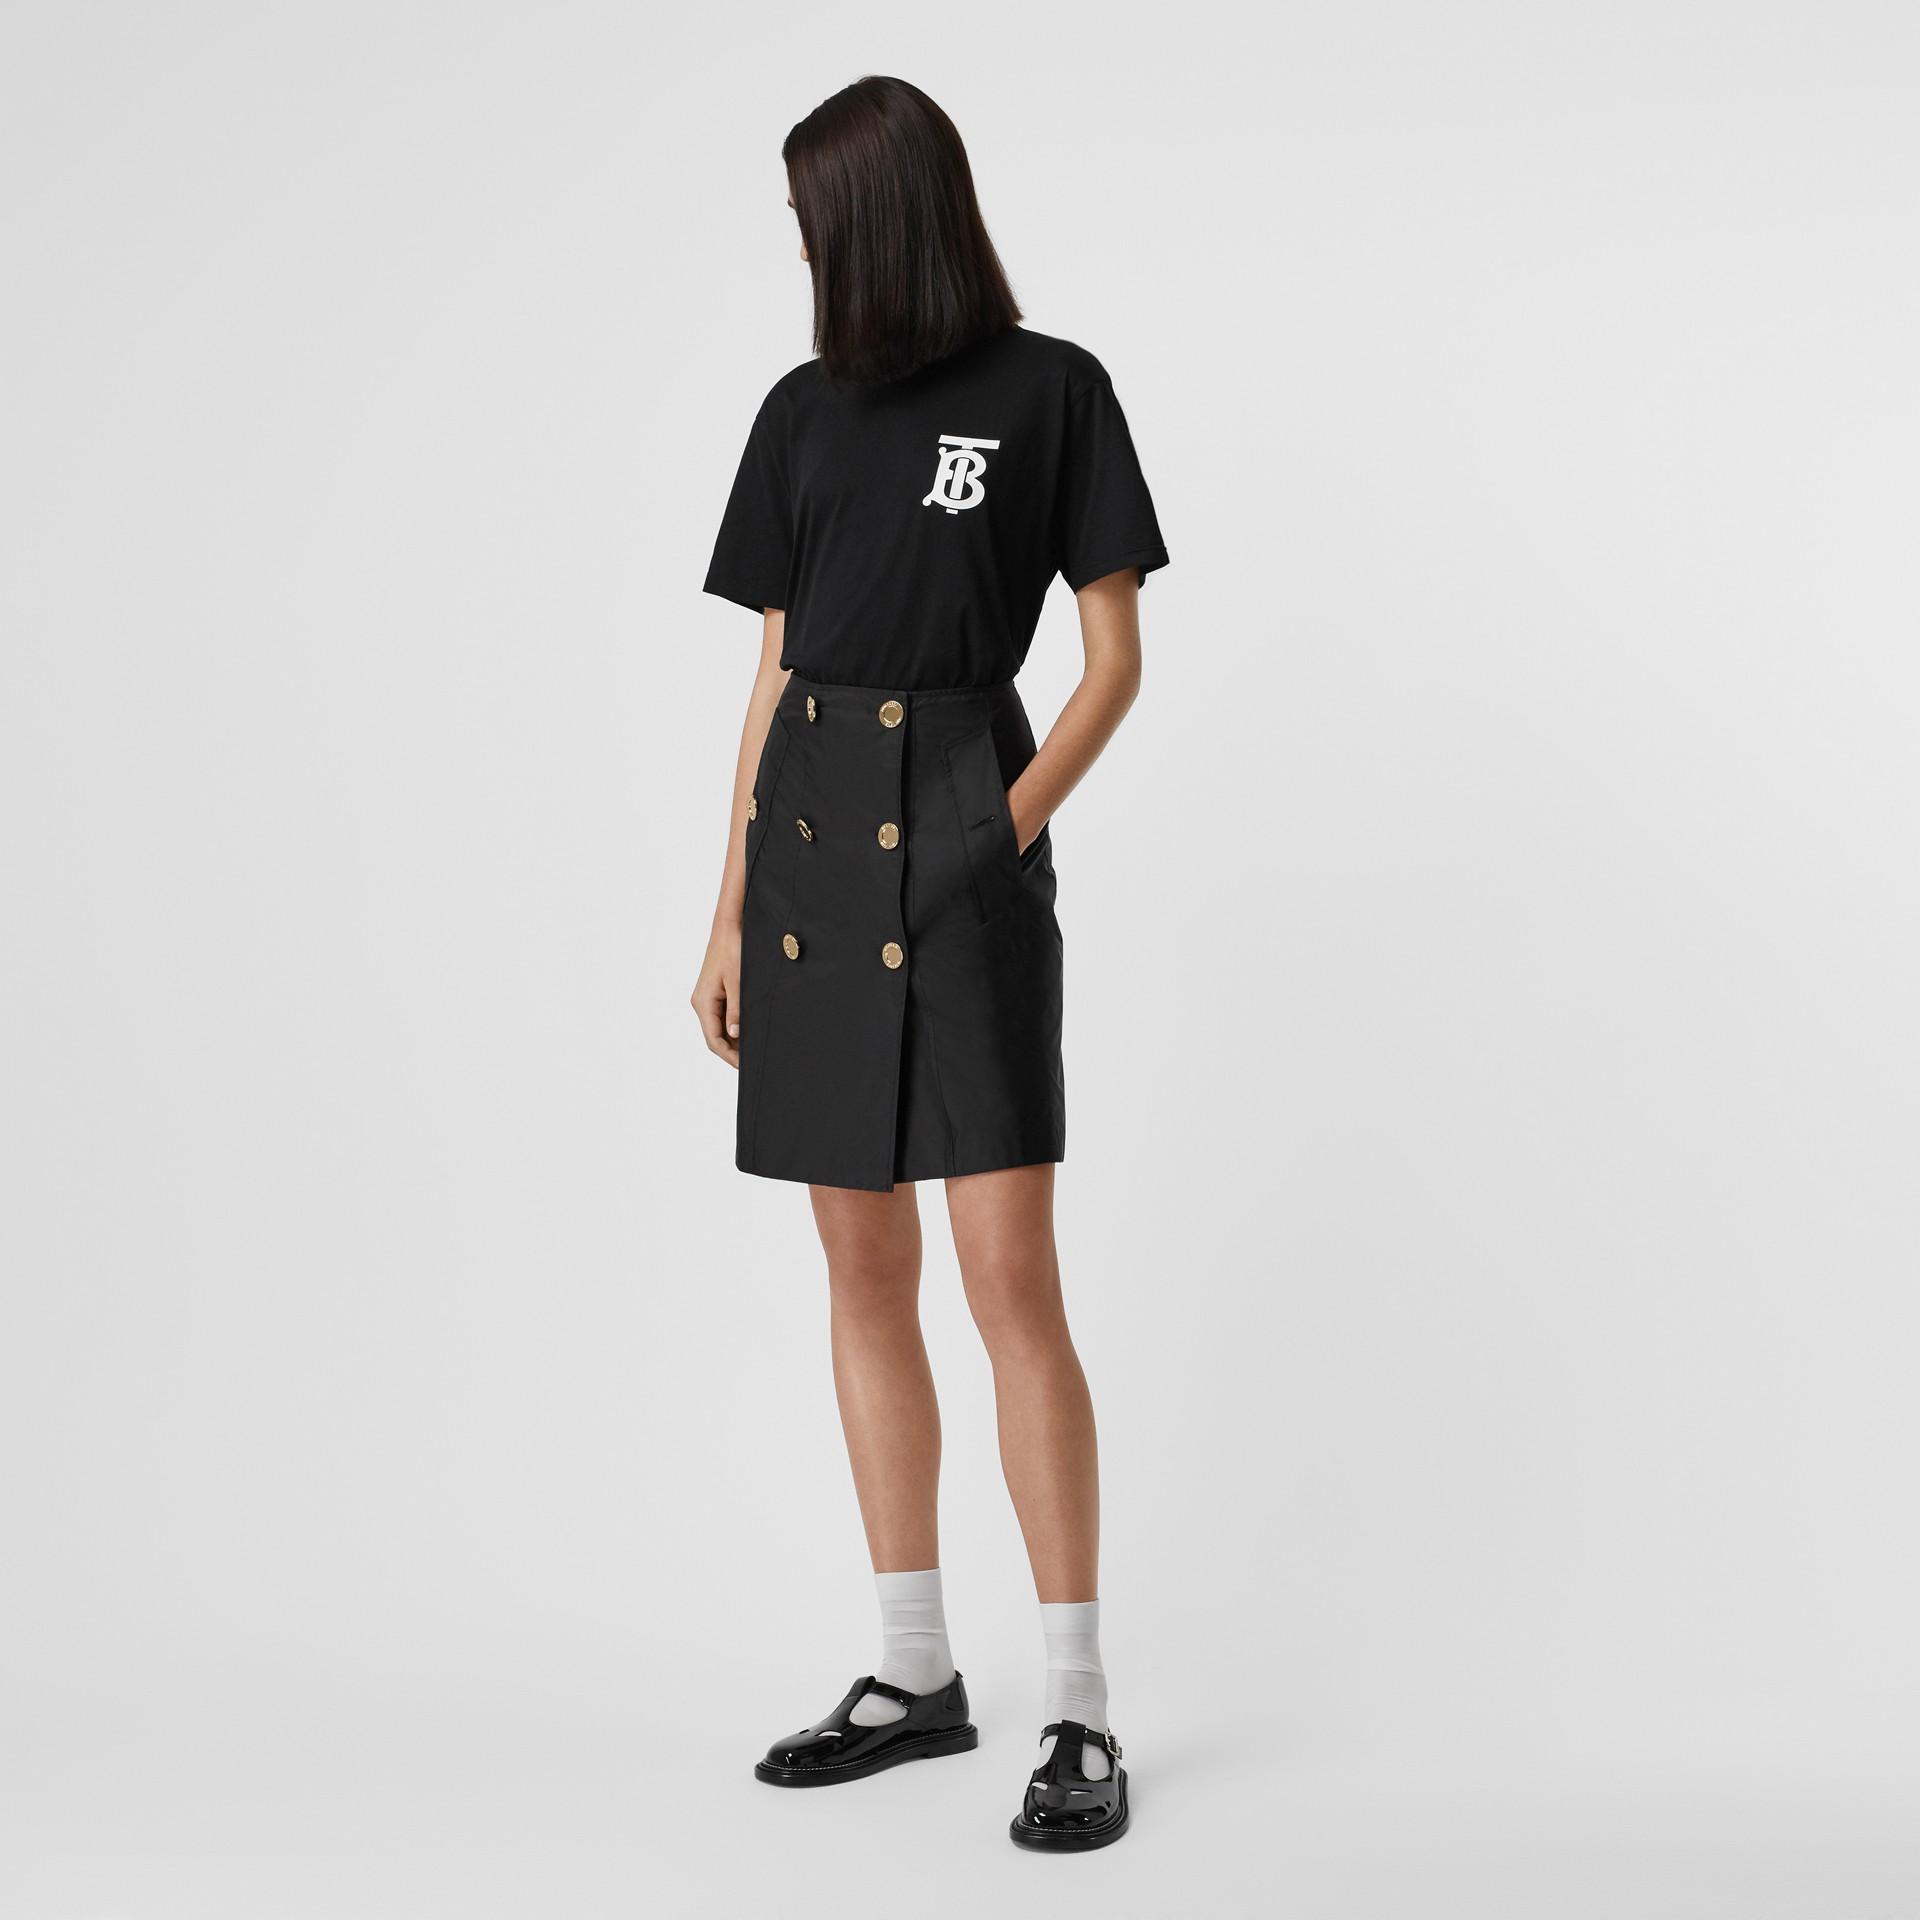 Nylon Trench Skirt in Black - Women | Burberry - gallery image 4